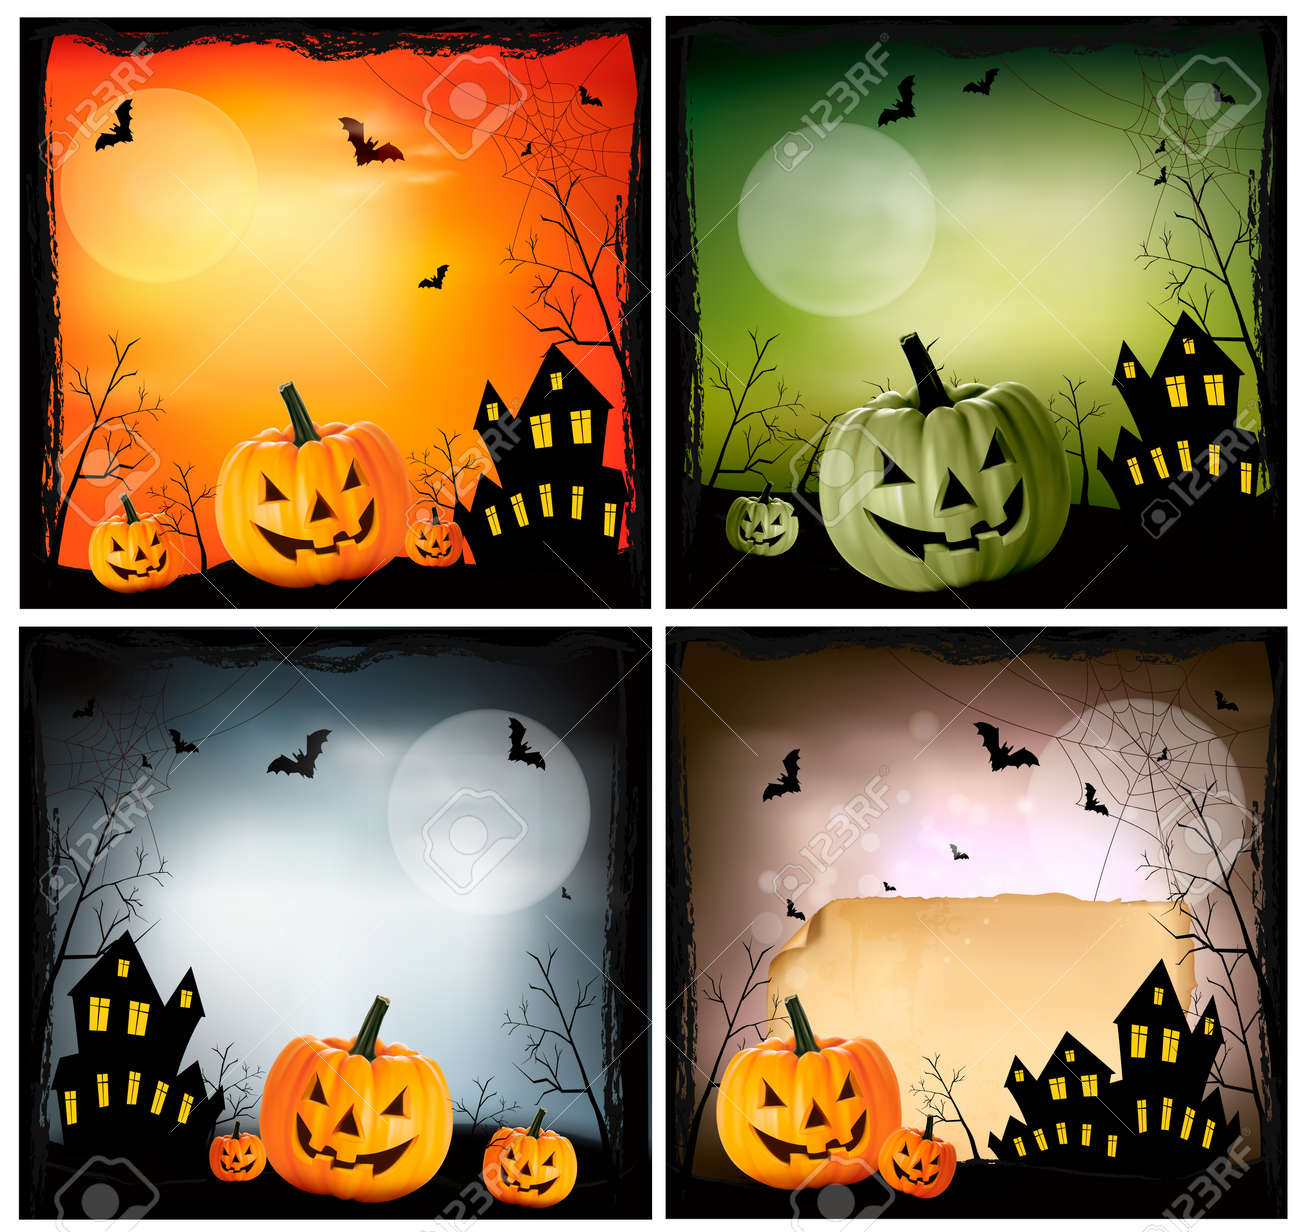 Four Halloween backgrounds Stock Vector - 15805703